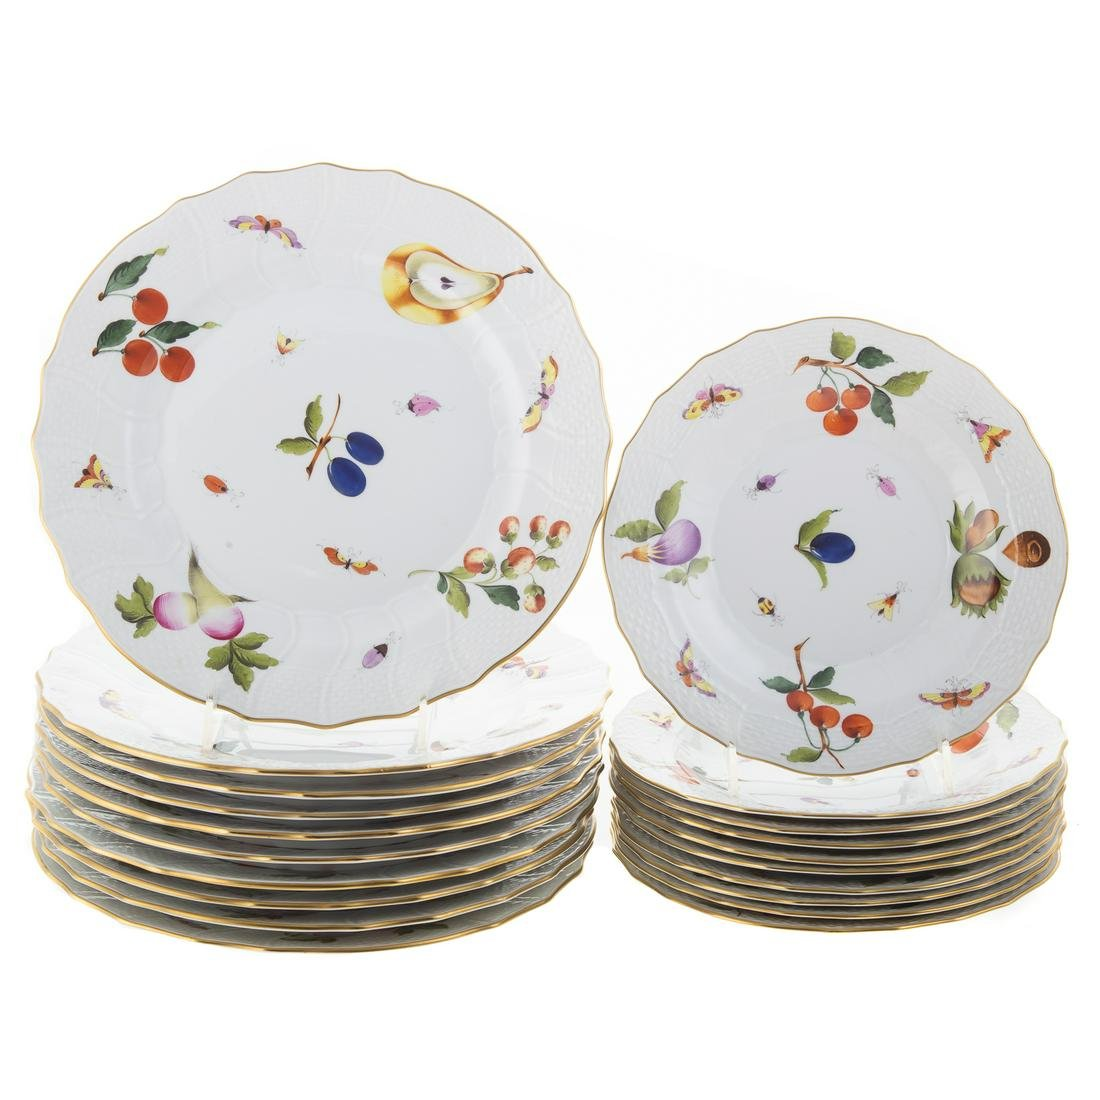 Herend /'Market Garden/' Double Egg Cup